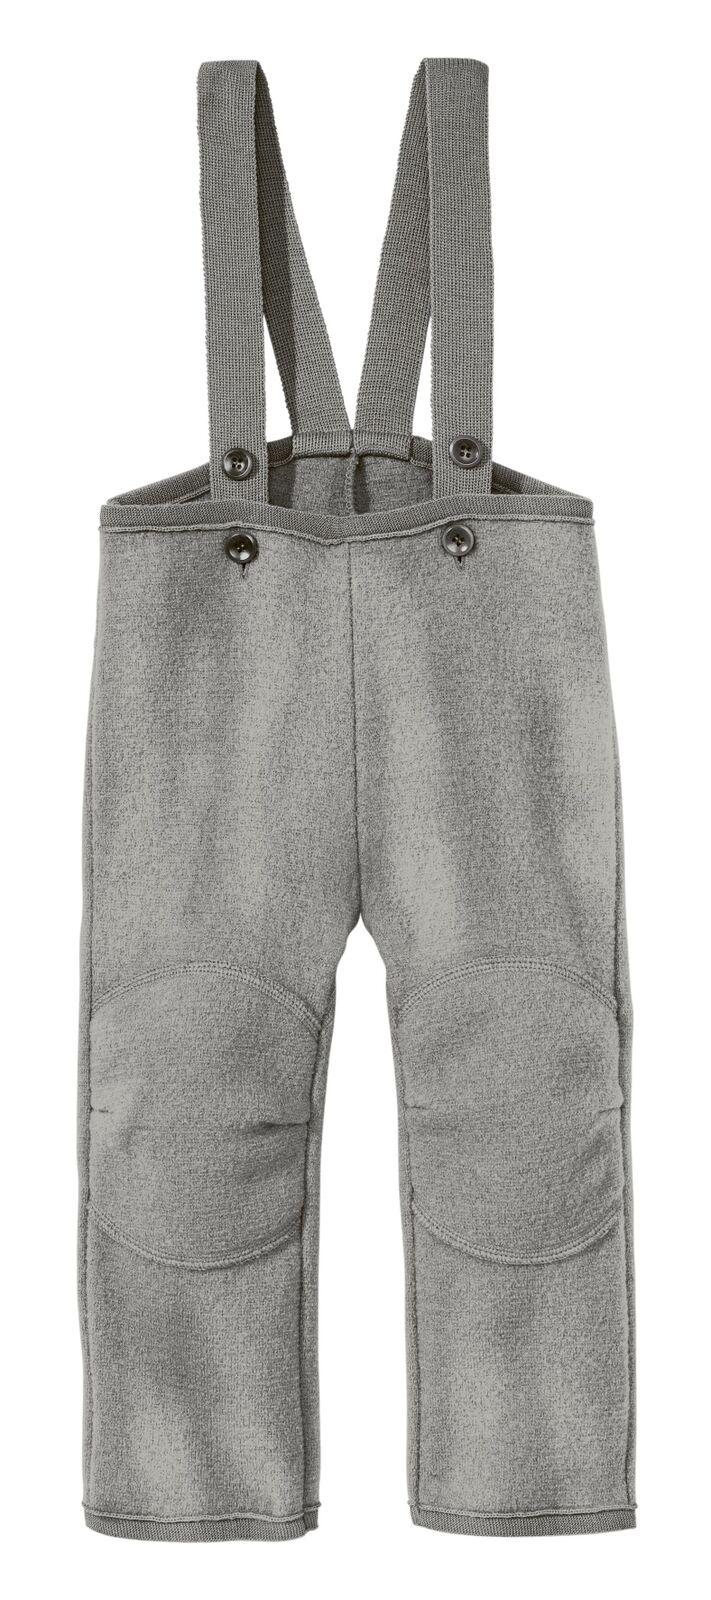 e9a94fc93c3 Selebukser i uld til baby og børn! Disana selebukser -> Køb her!